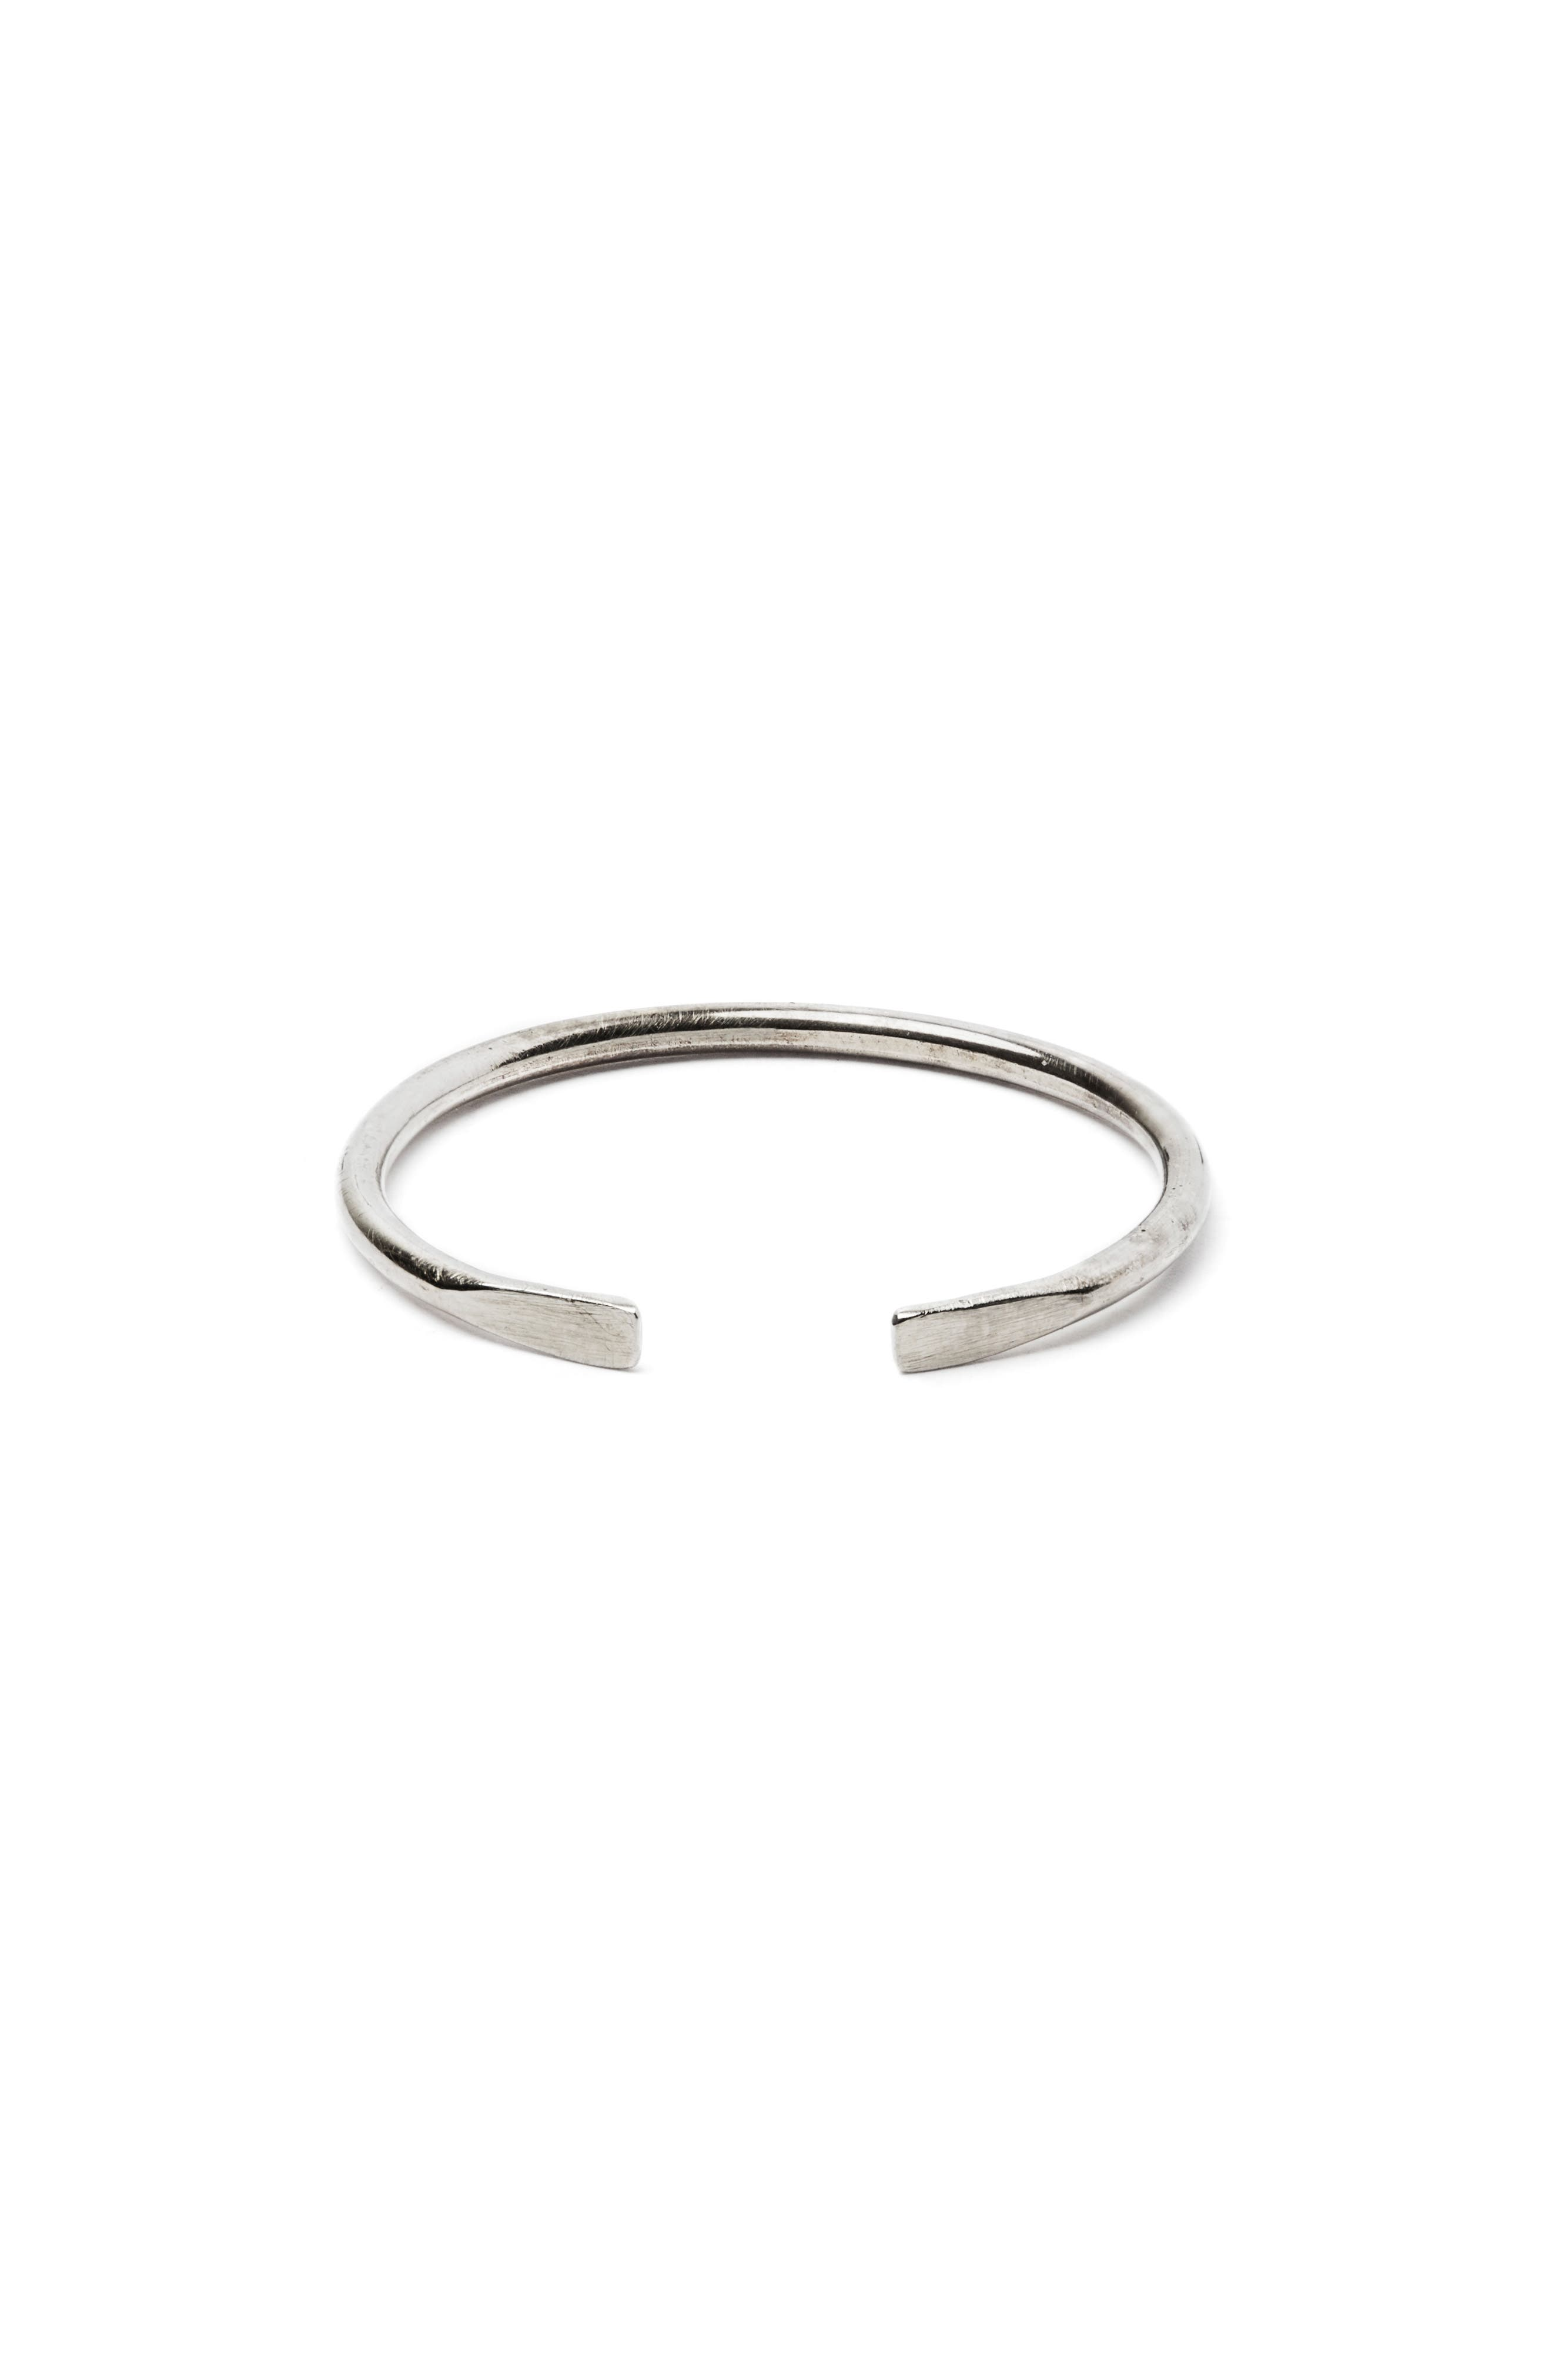 18k White Gold Ring,                             Main thumbnail 1, color,                             SILVER